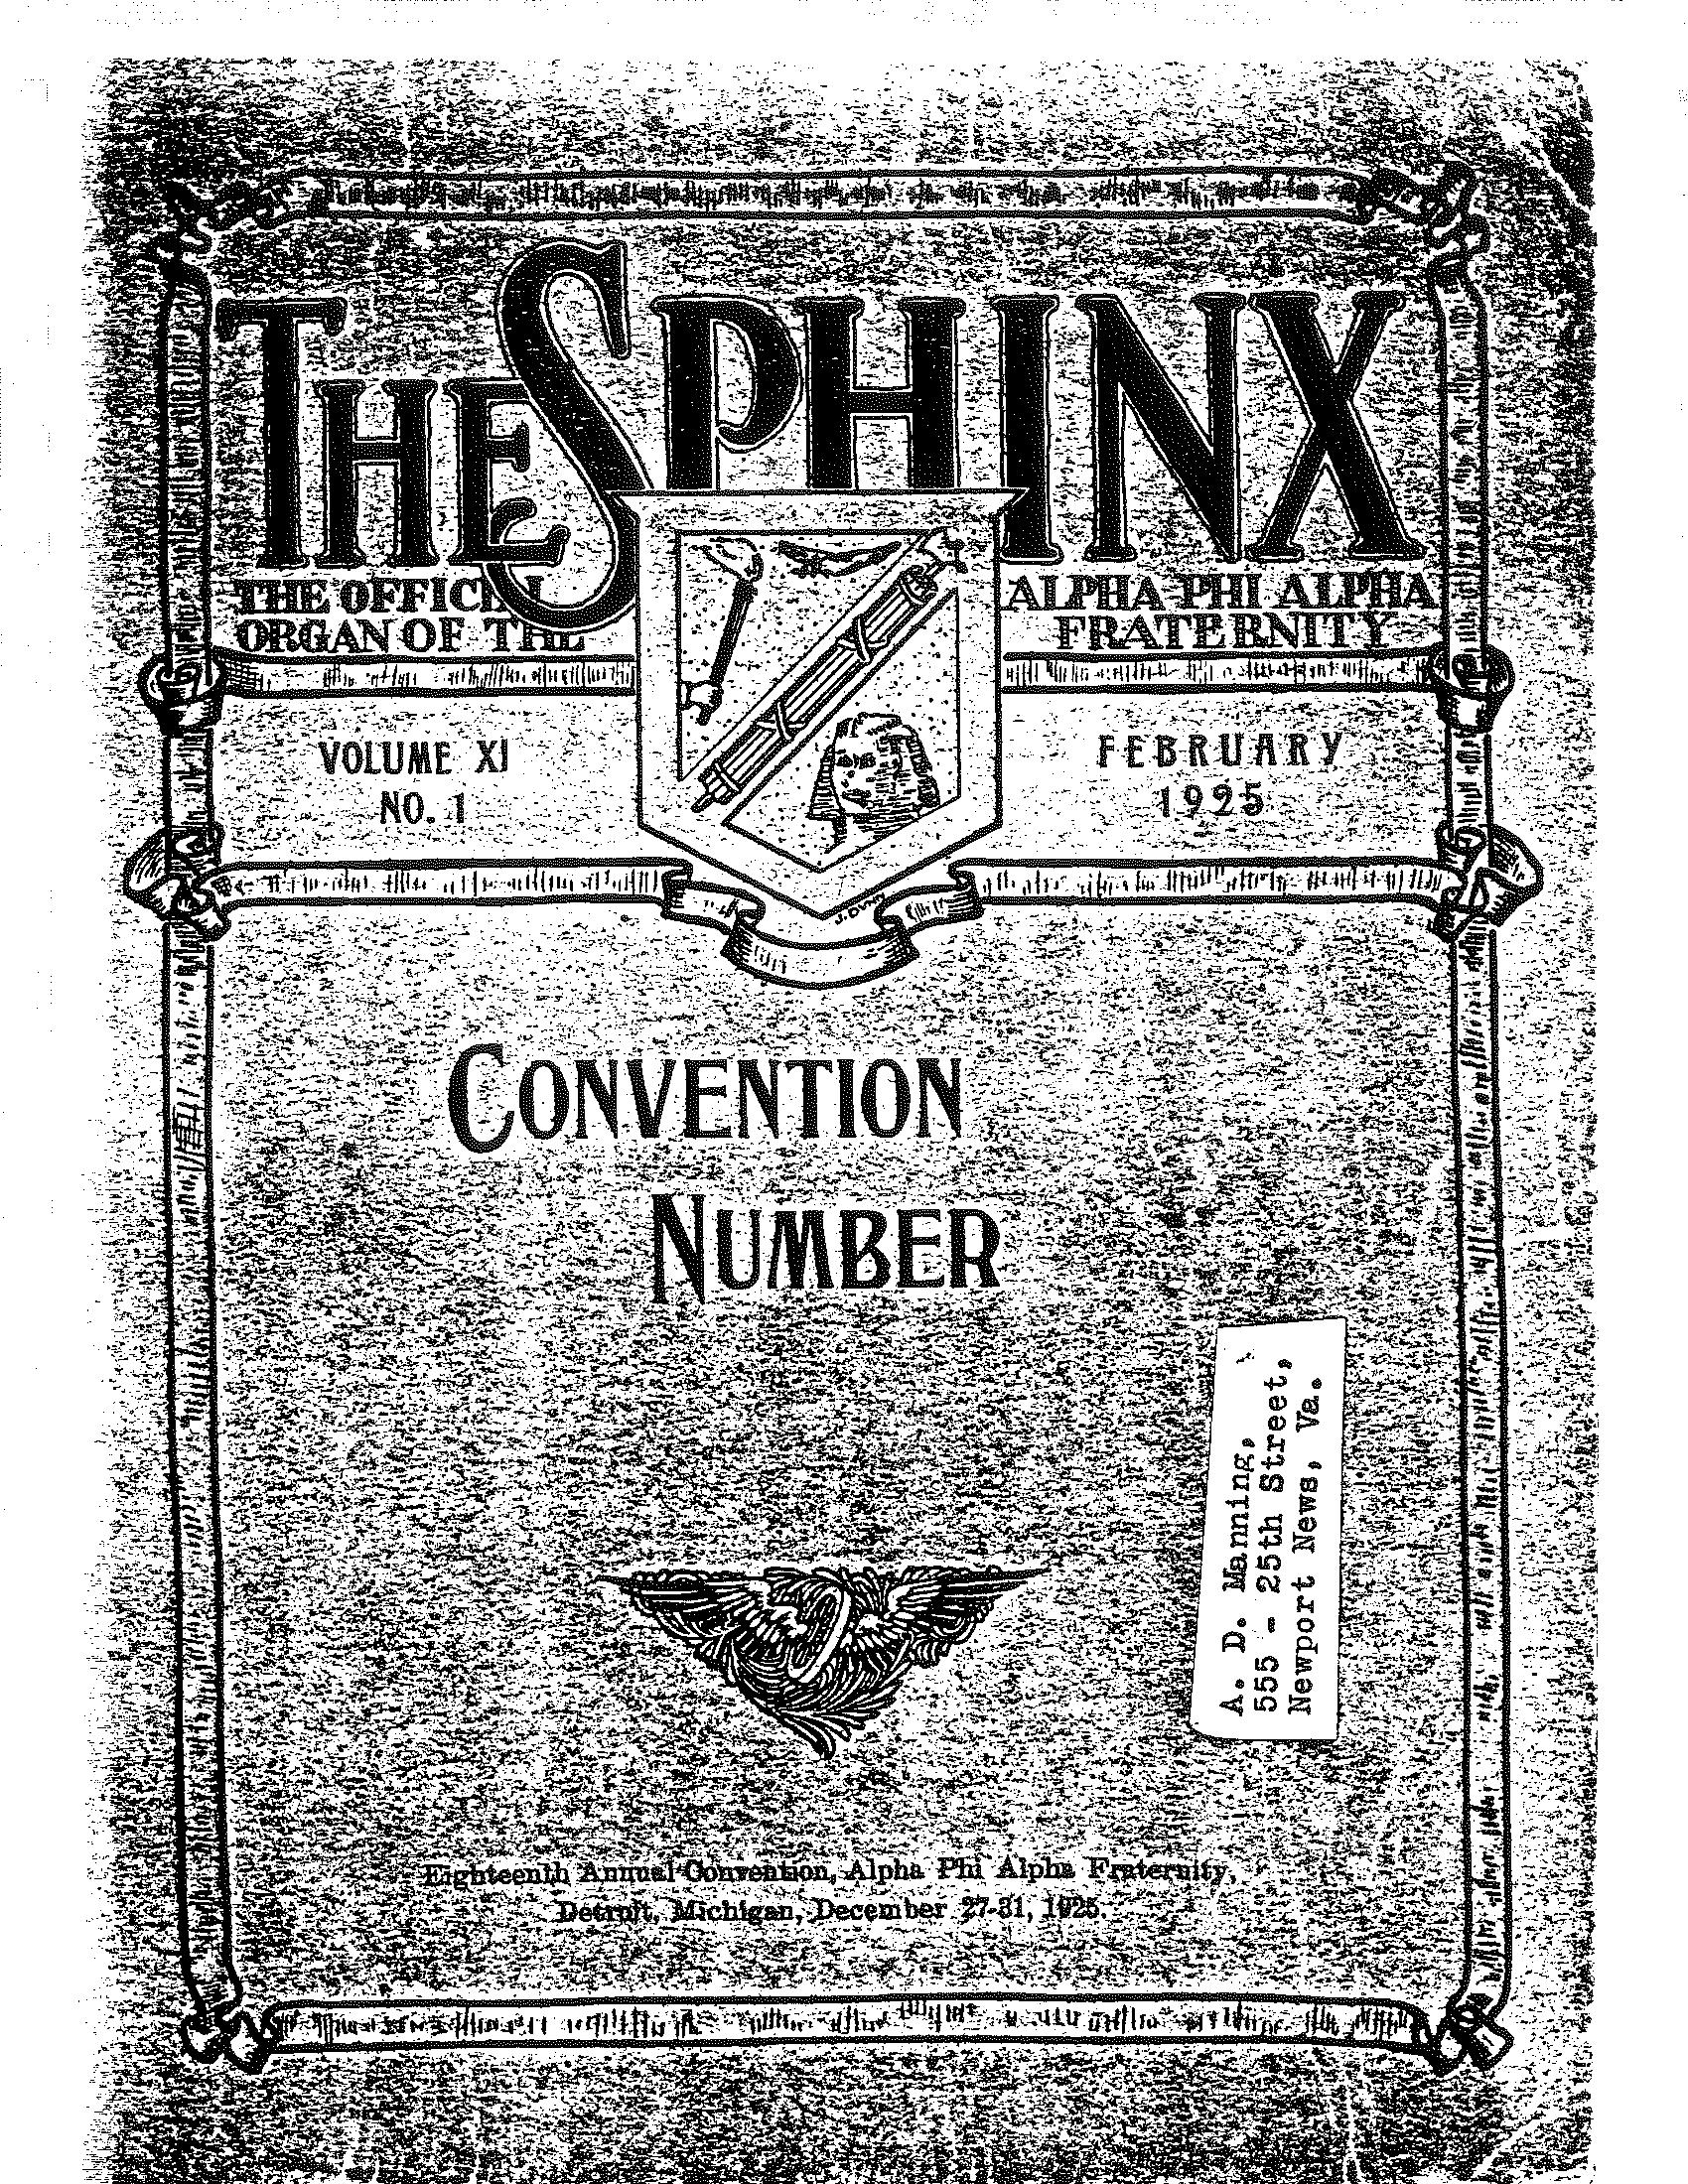 Zeta Lambda 1925 - The Sphinx Cover-1.png